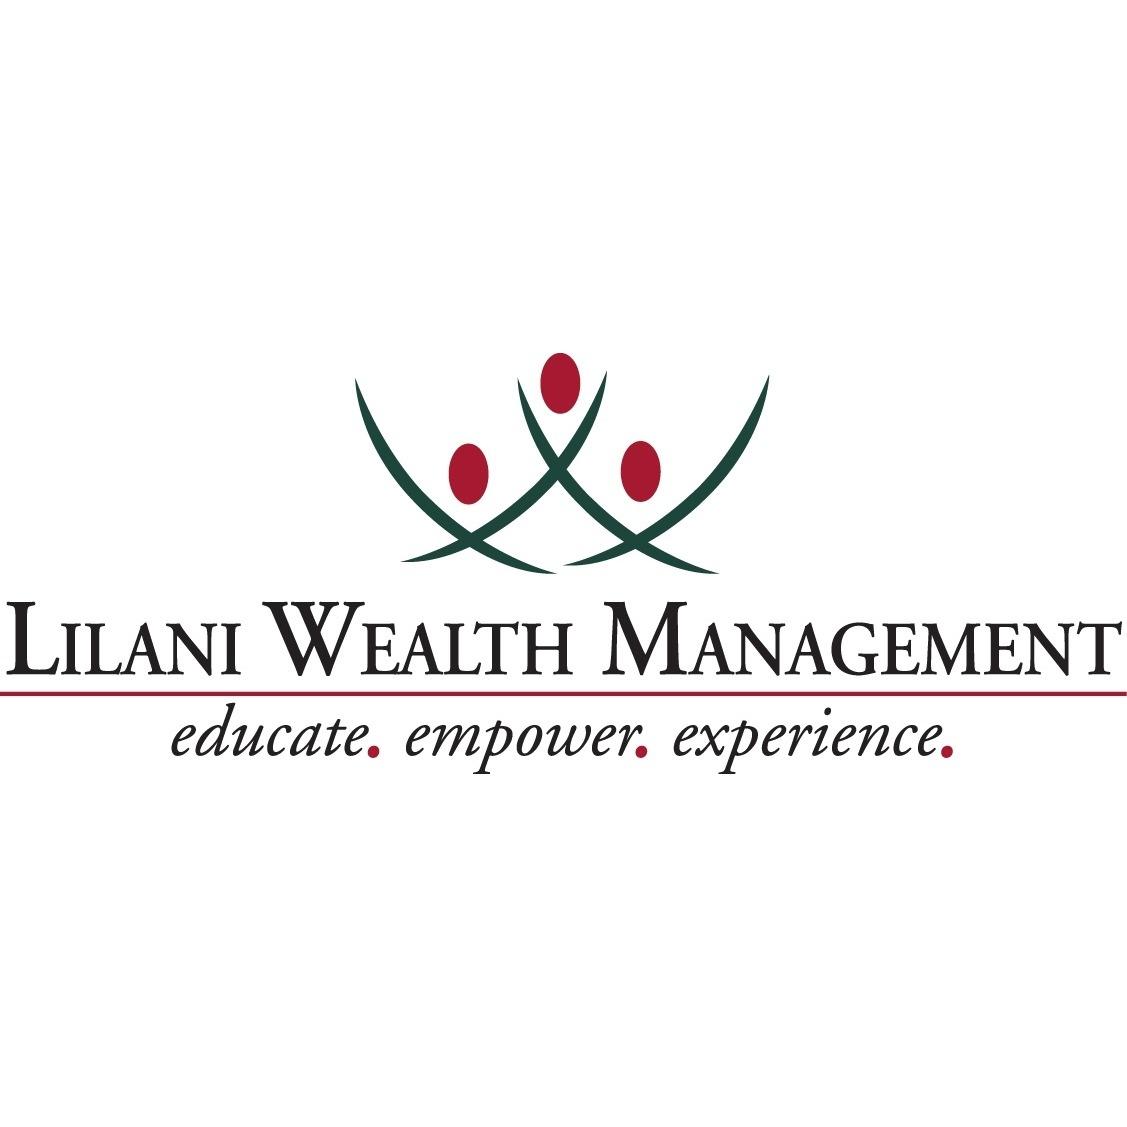 Lilani Wealth Management